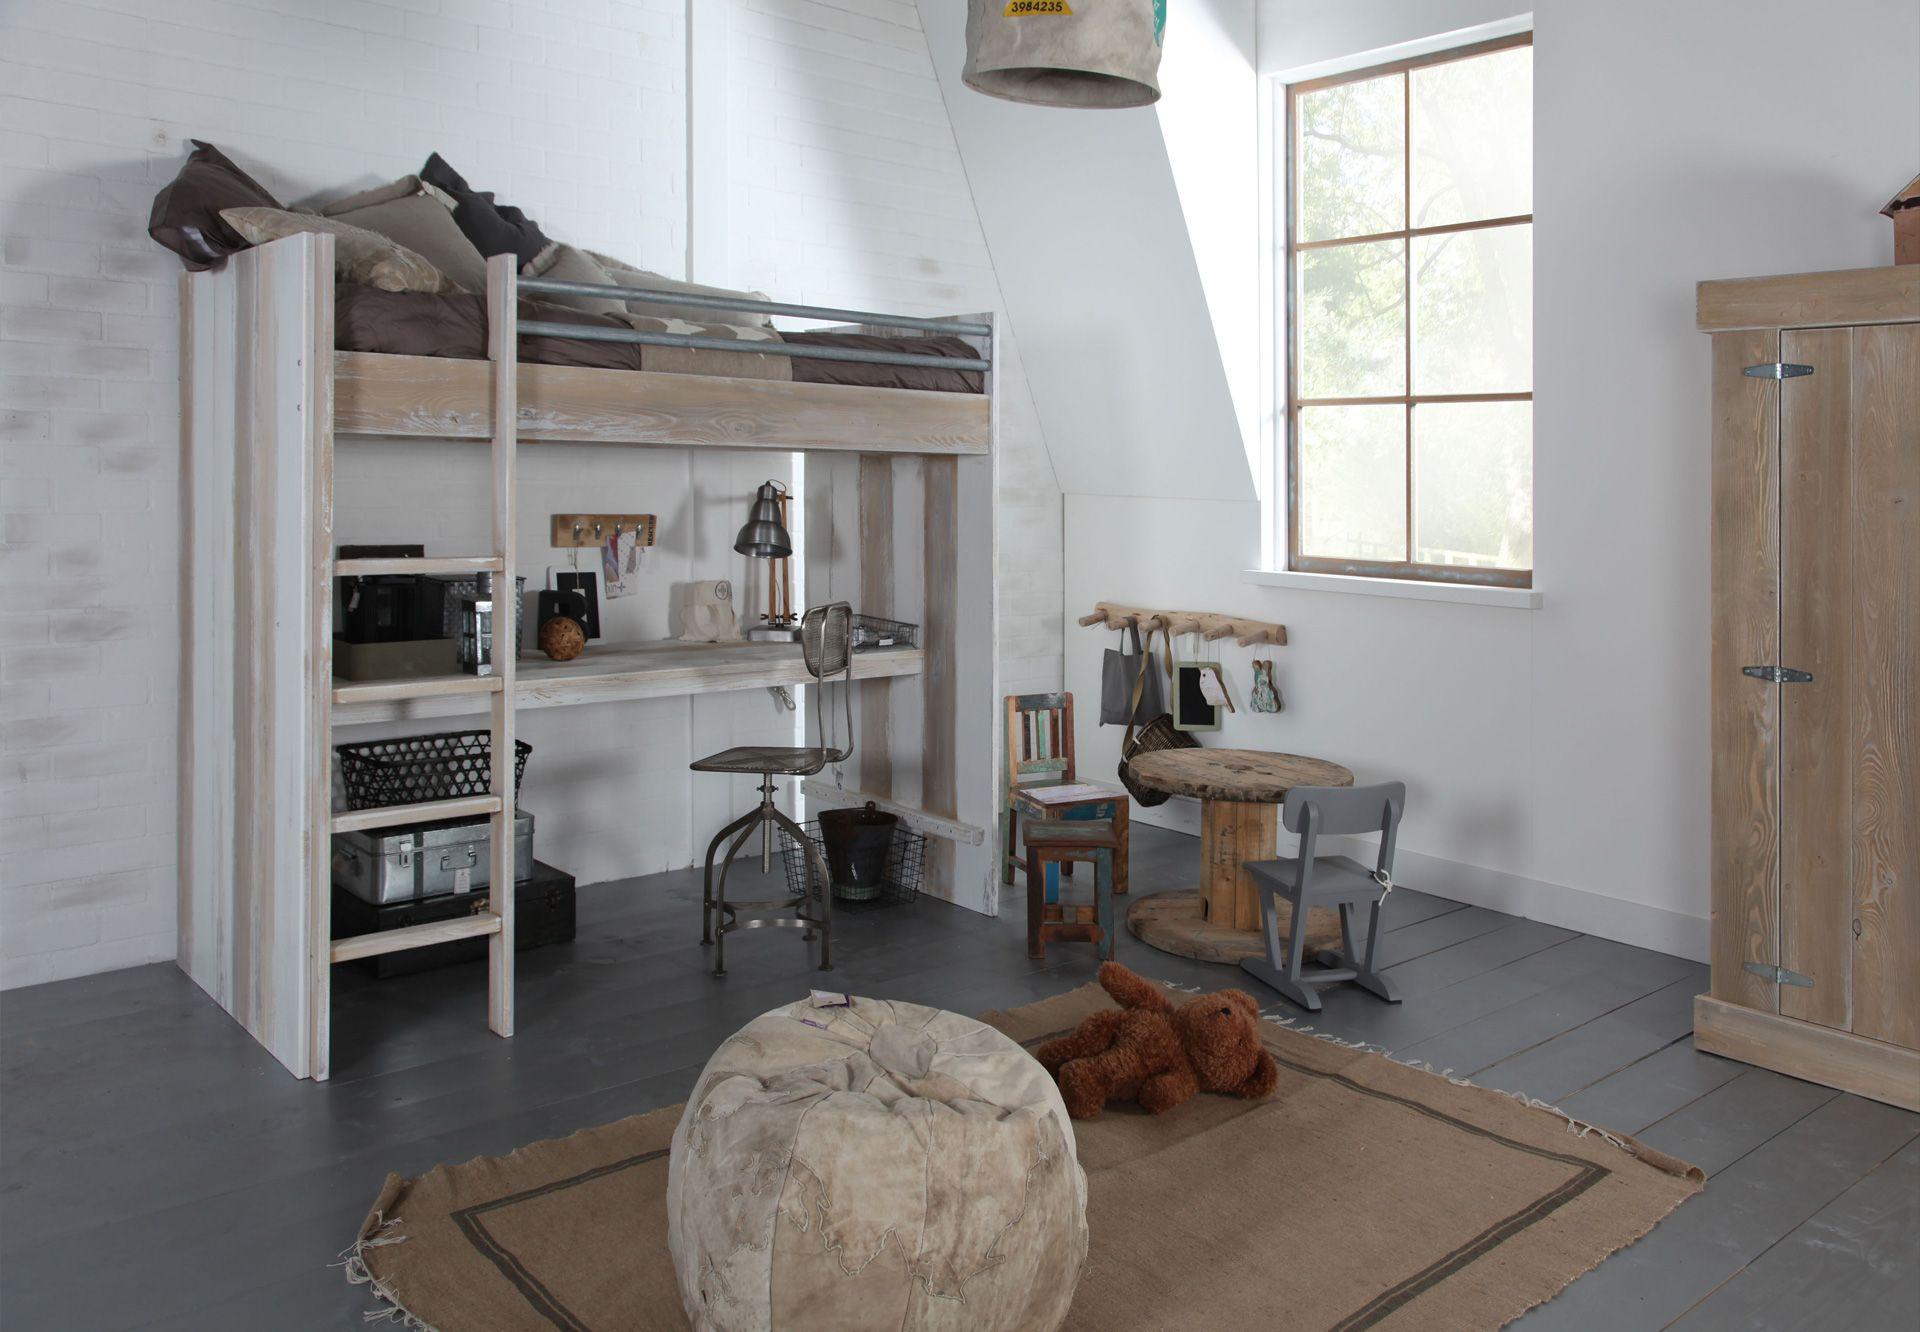 Loft designs adding second floor to modern interiors decor